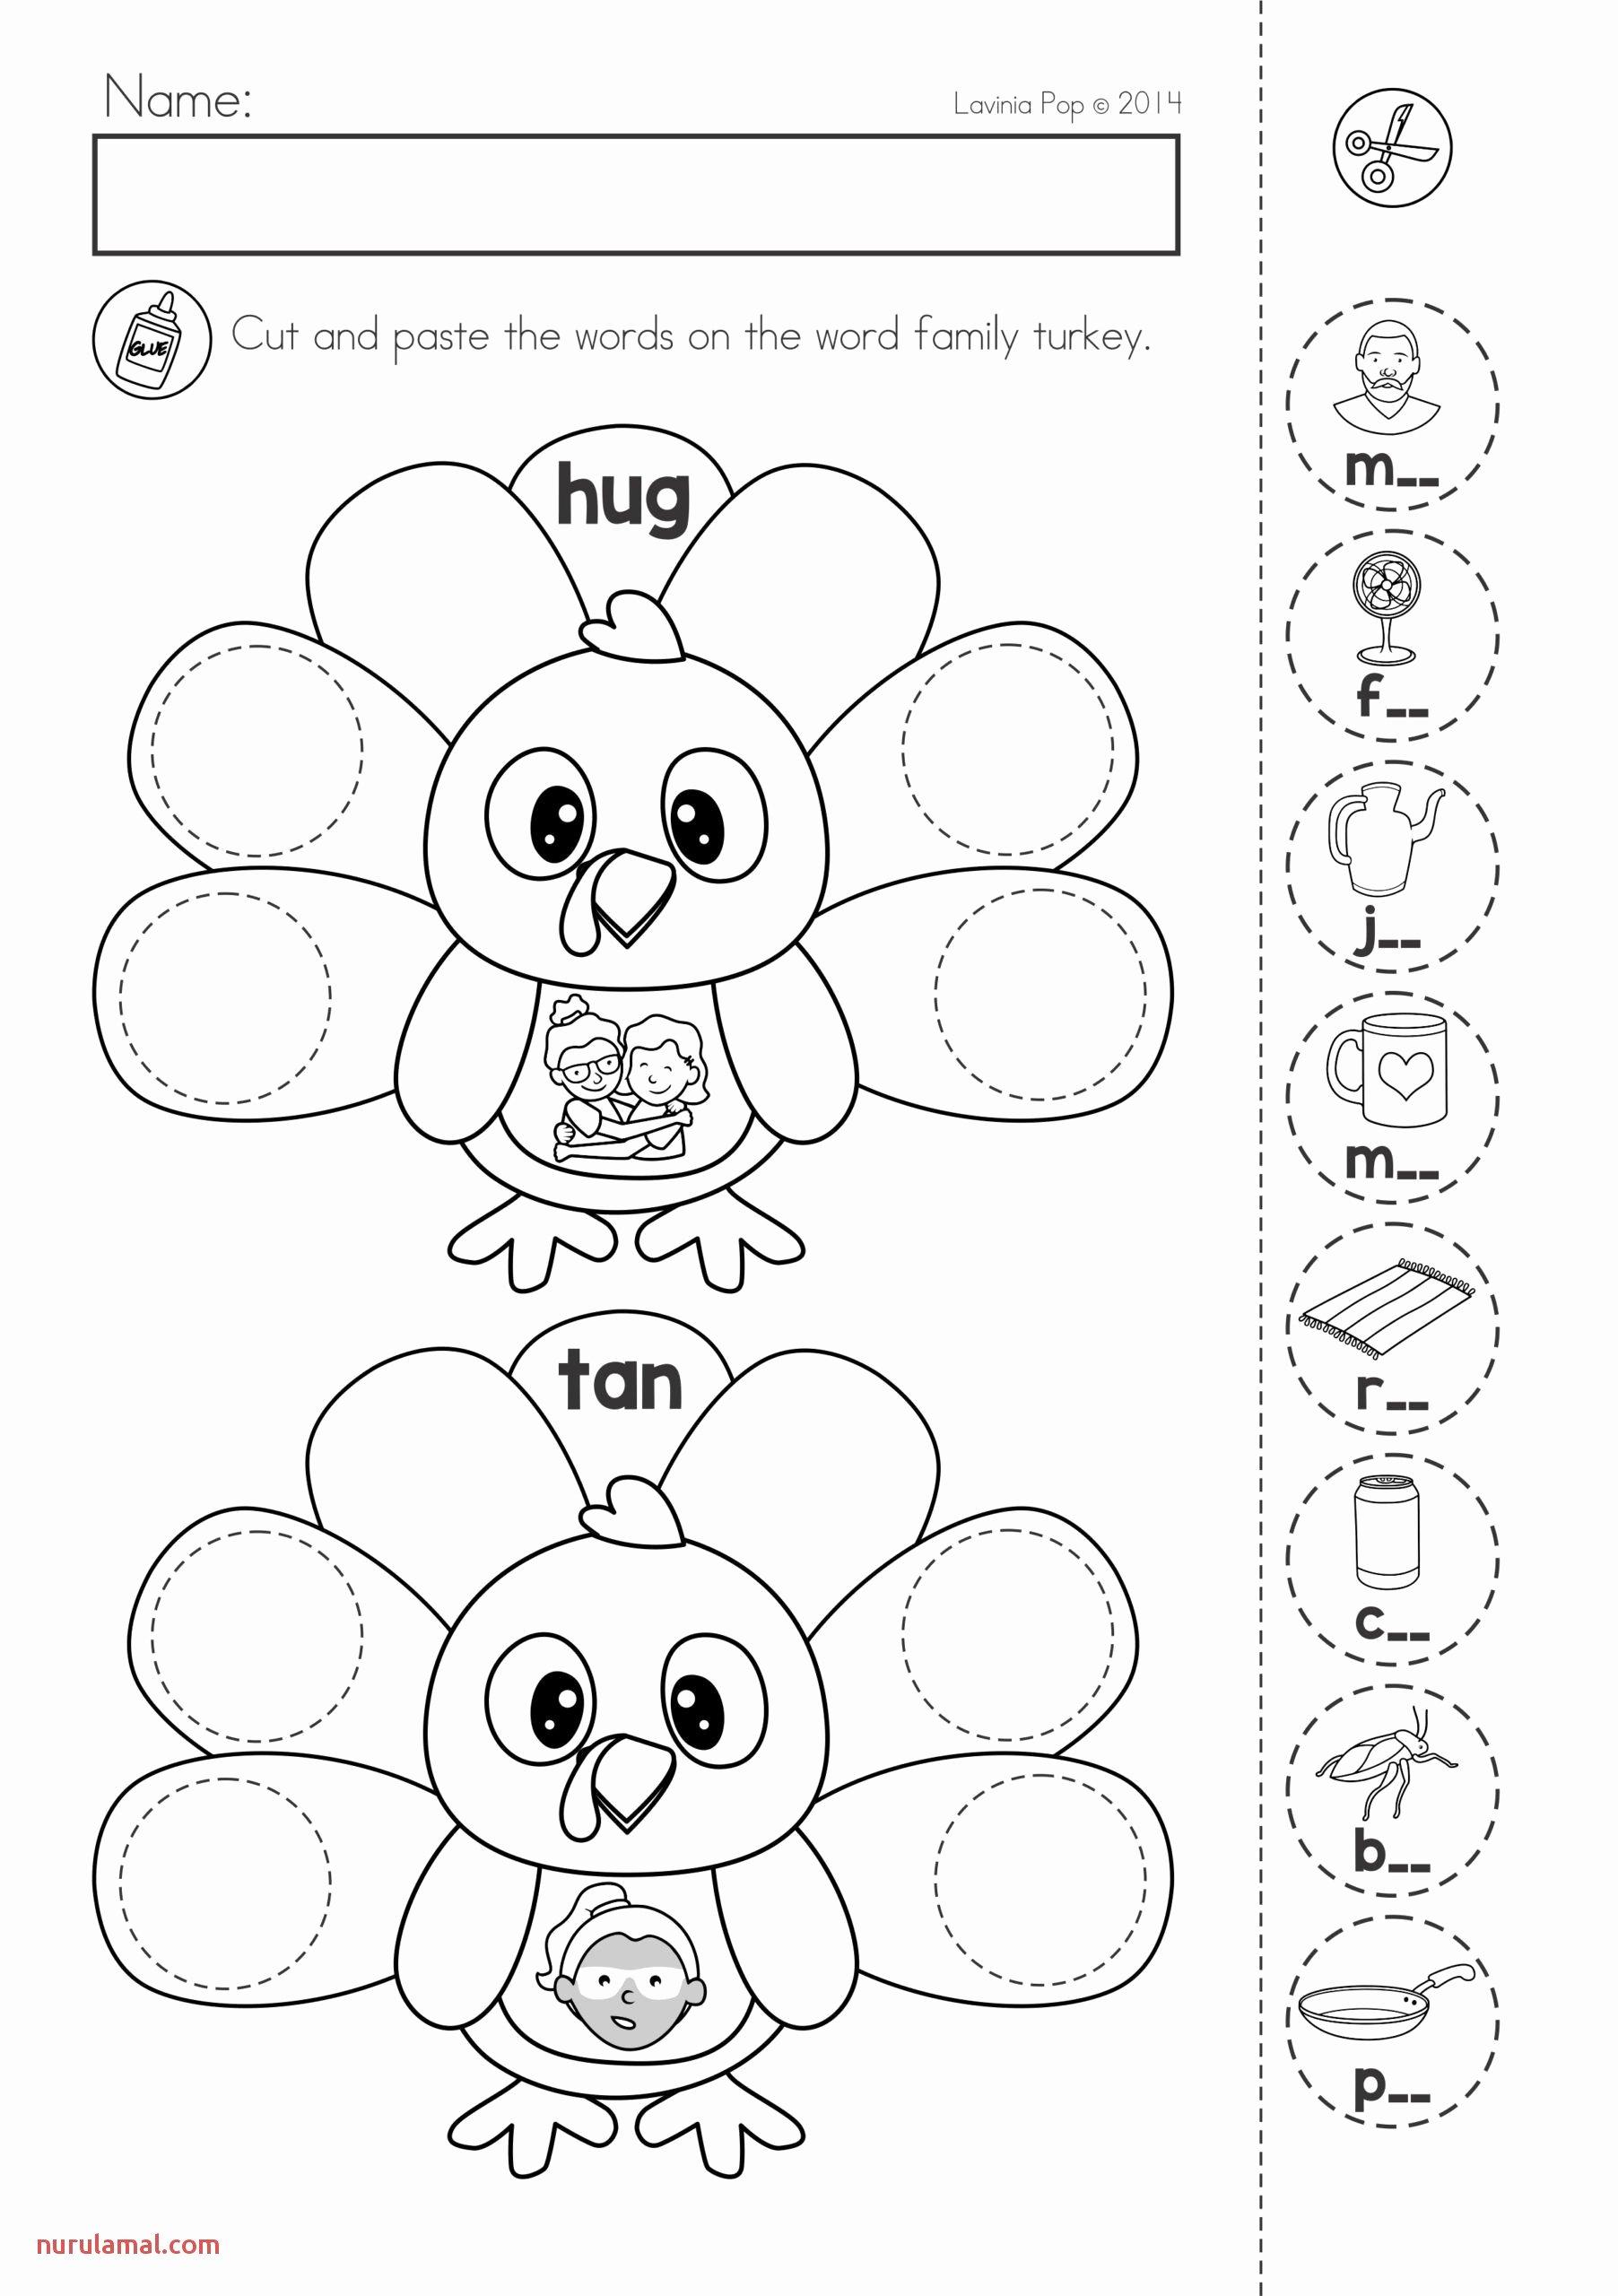 Urdu Worksheets for Preschoolers Unique Worksheets Urdu Jor tor Tracing Words Pdf for Kids In